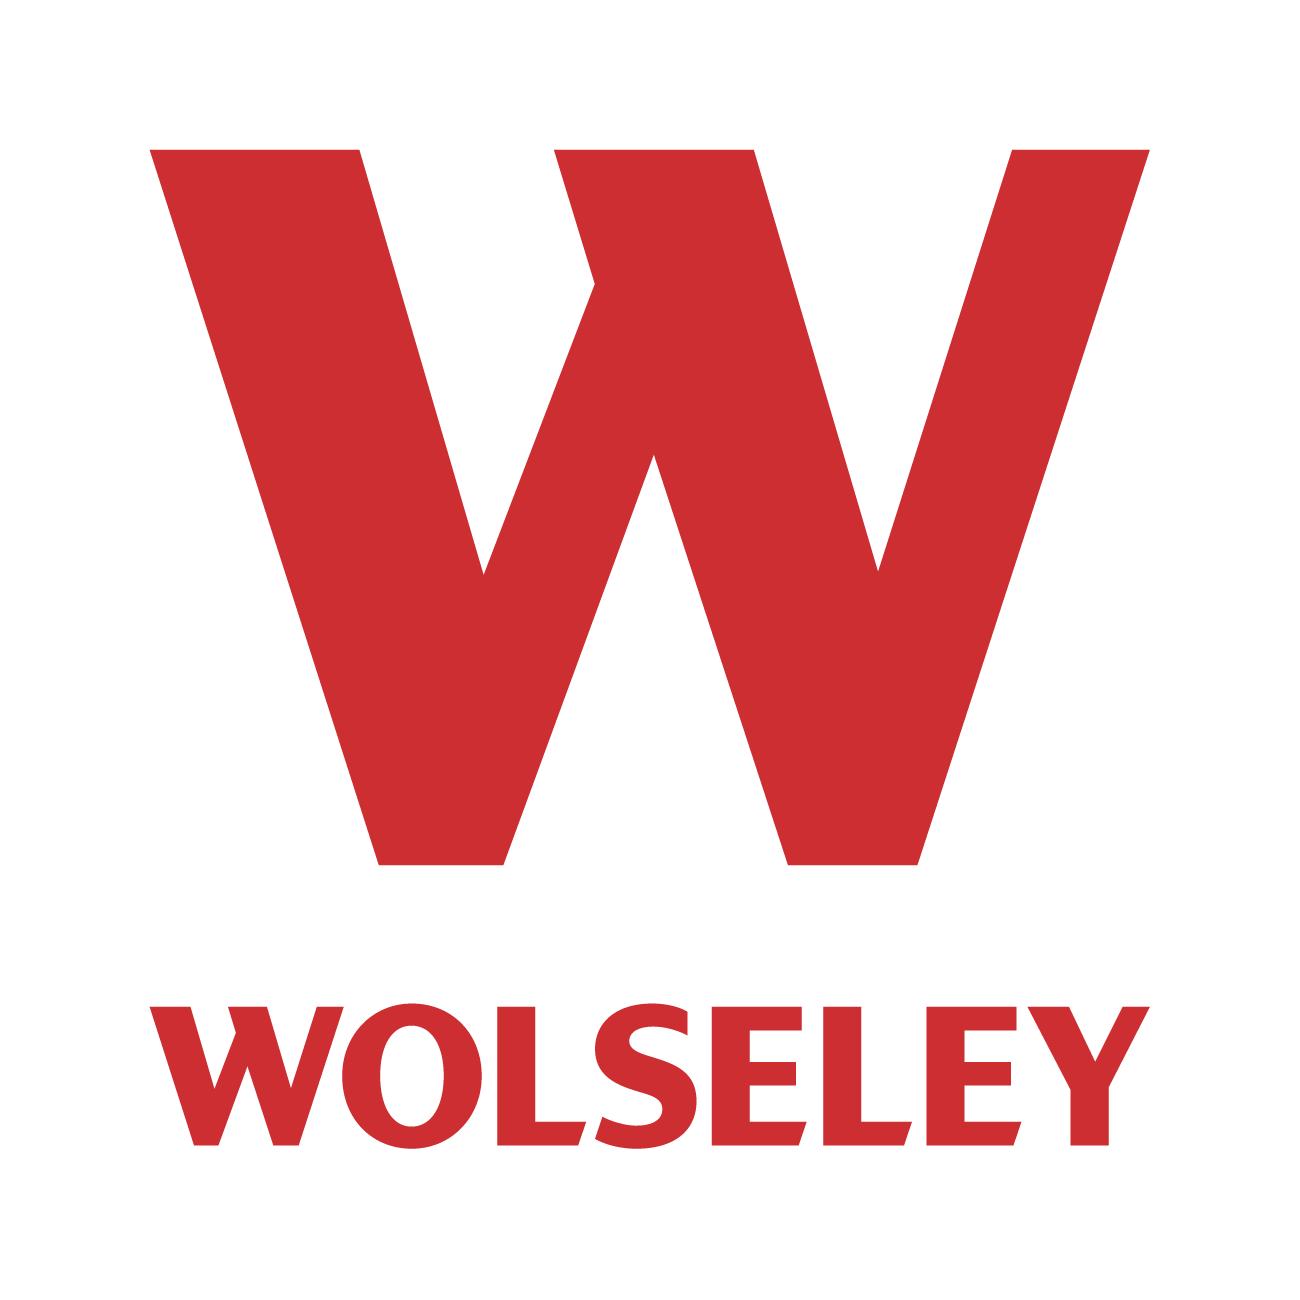 Wolseley Company Logo